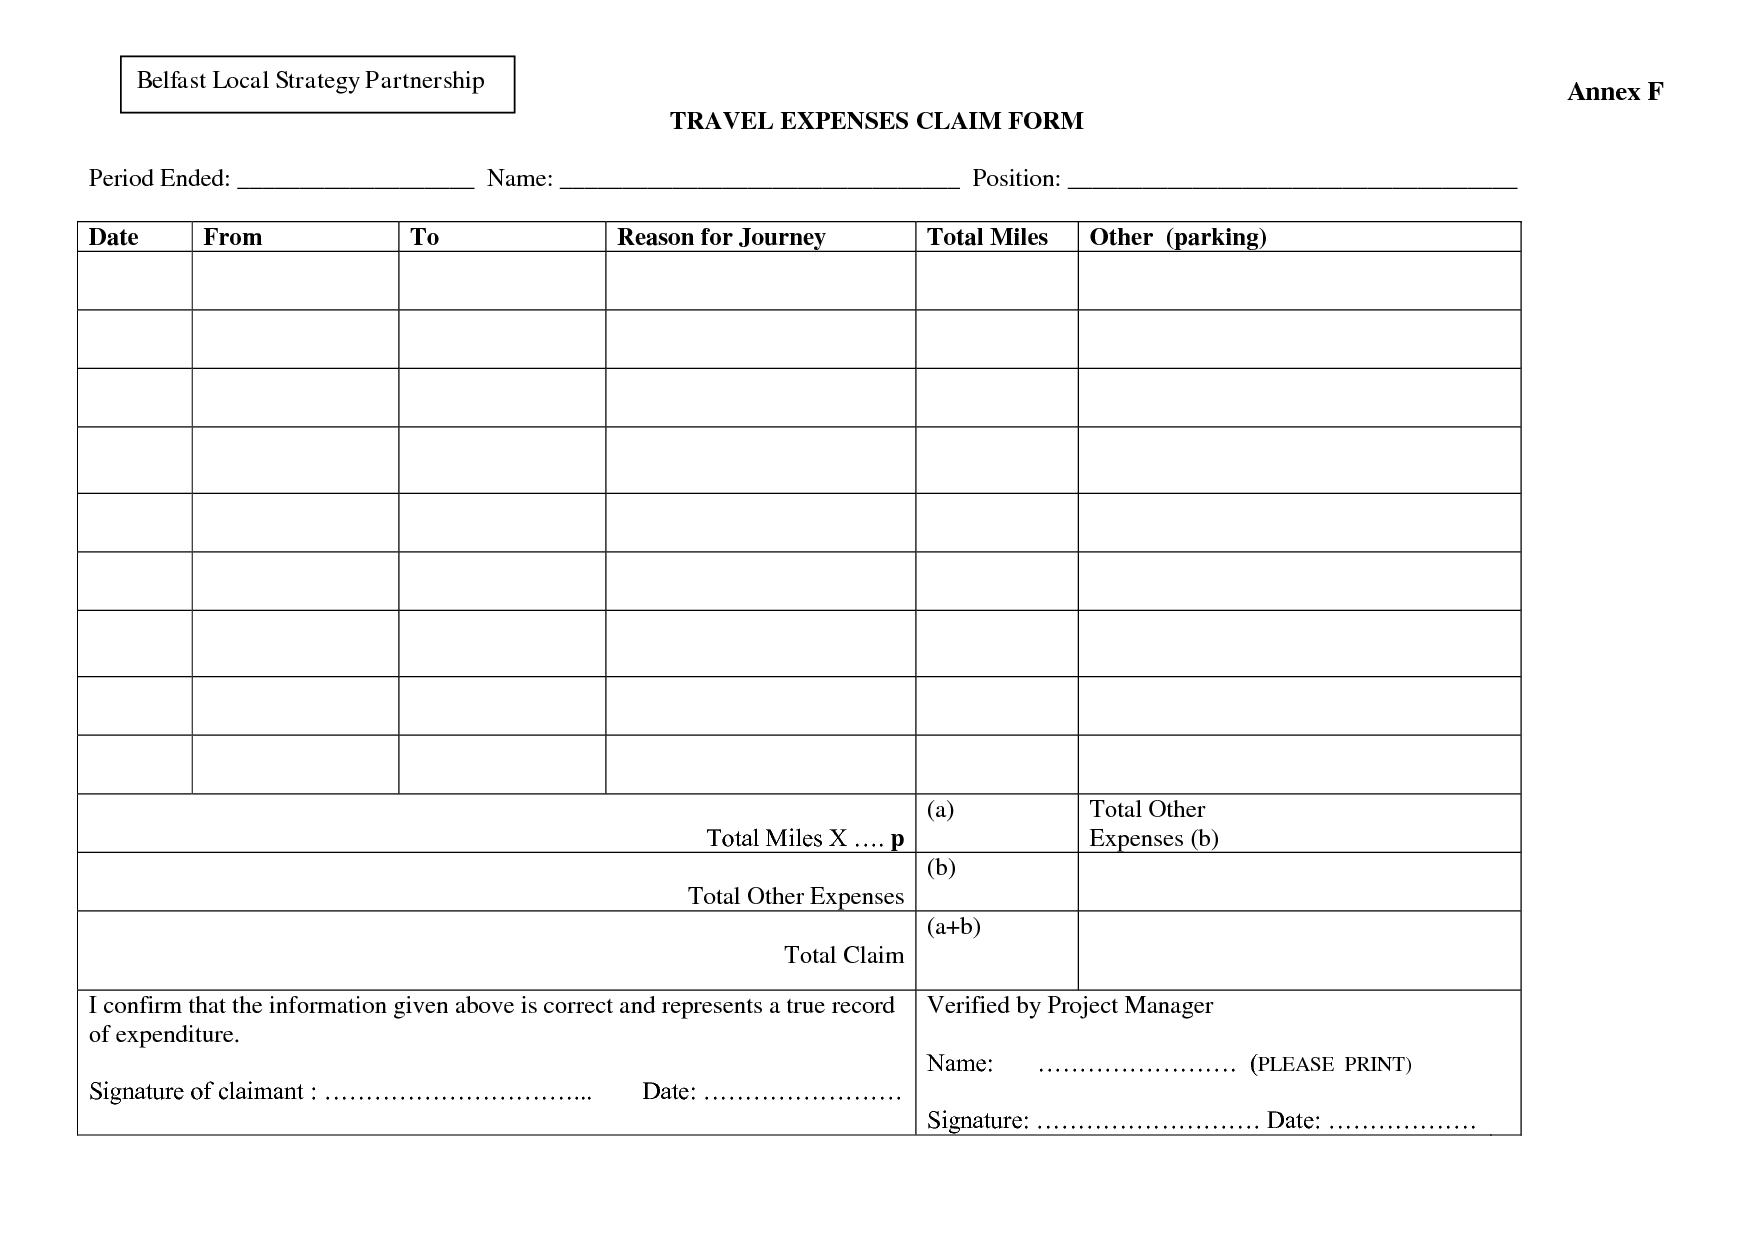 Expense Claim Form Templates